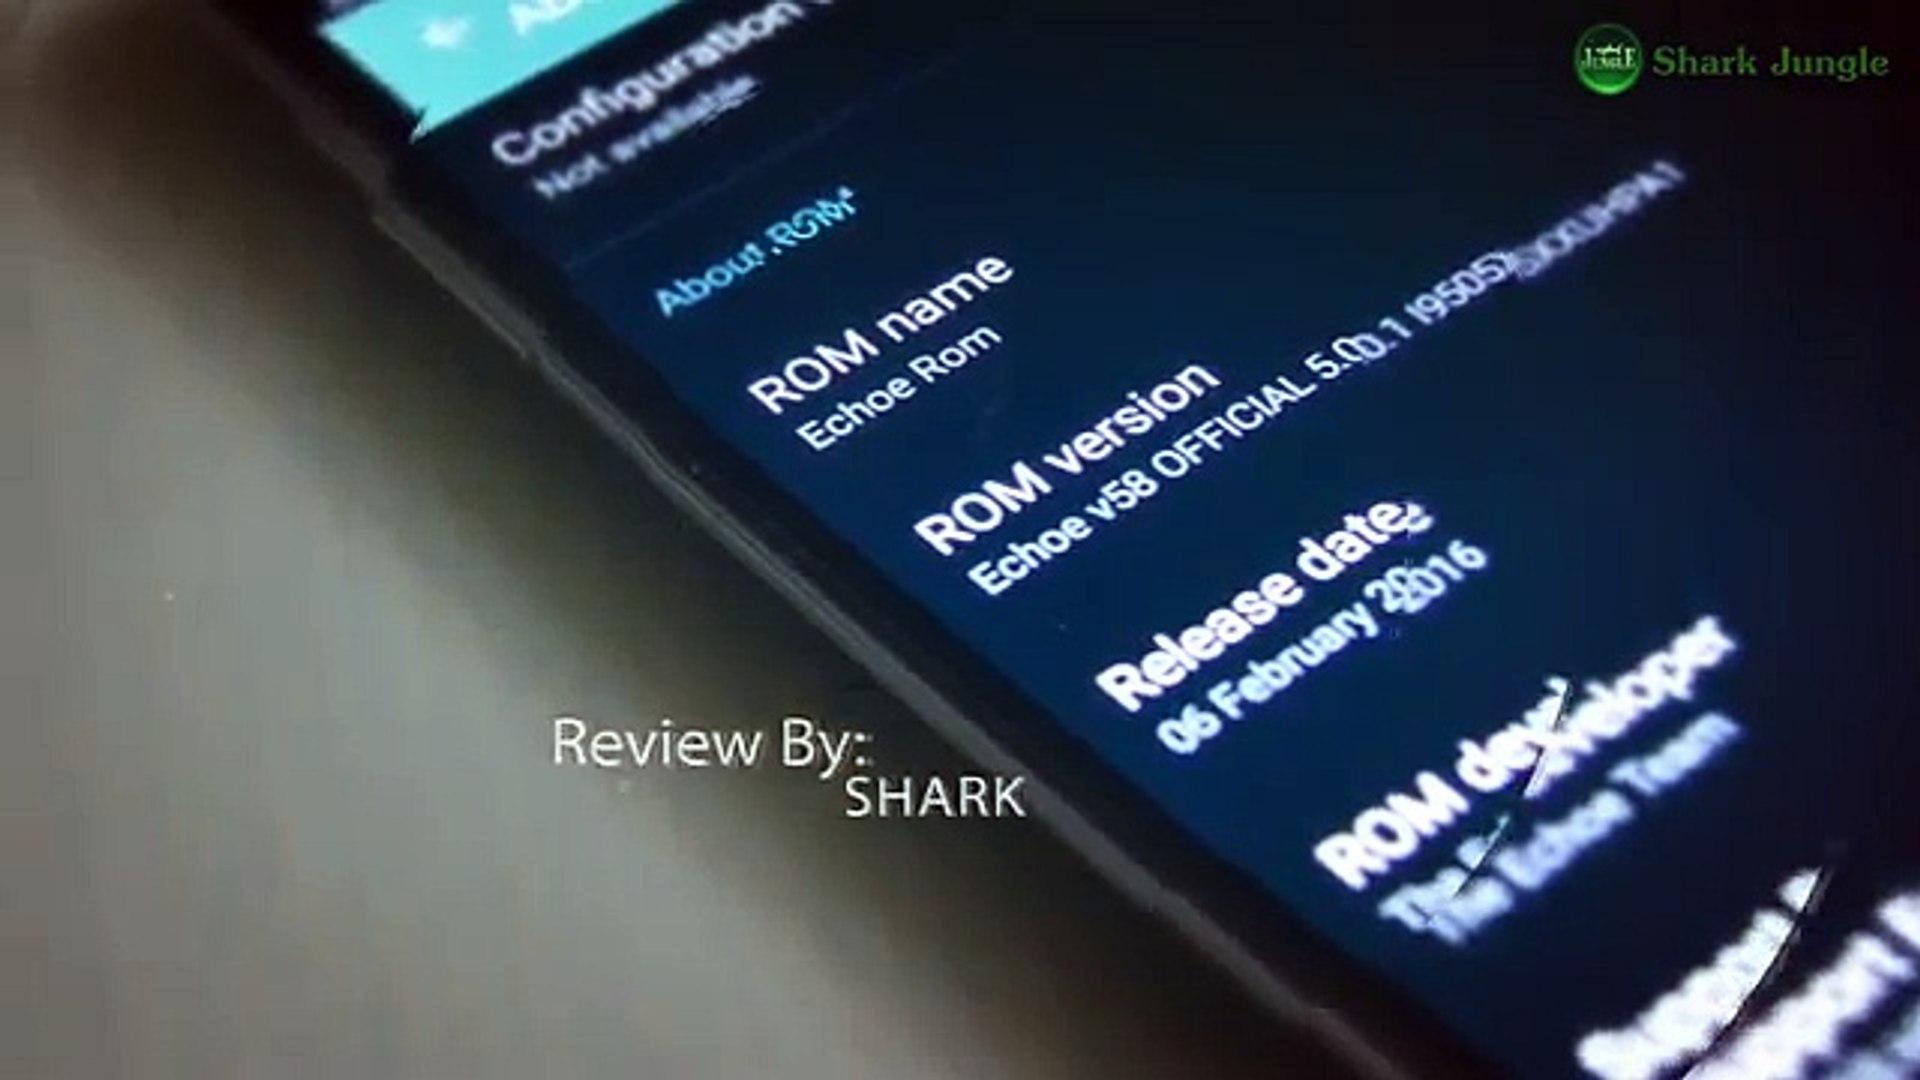 Echoe ROM v58 Samsung Galaxy S4 I9505